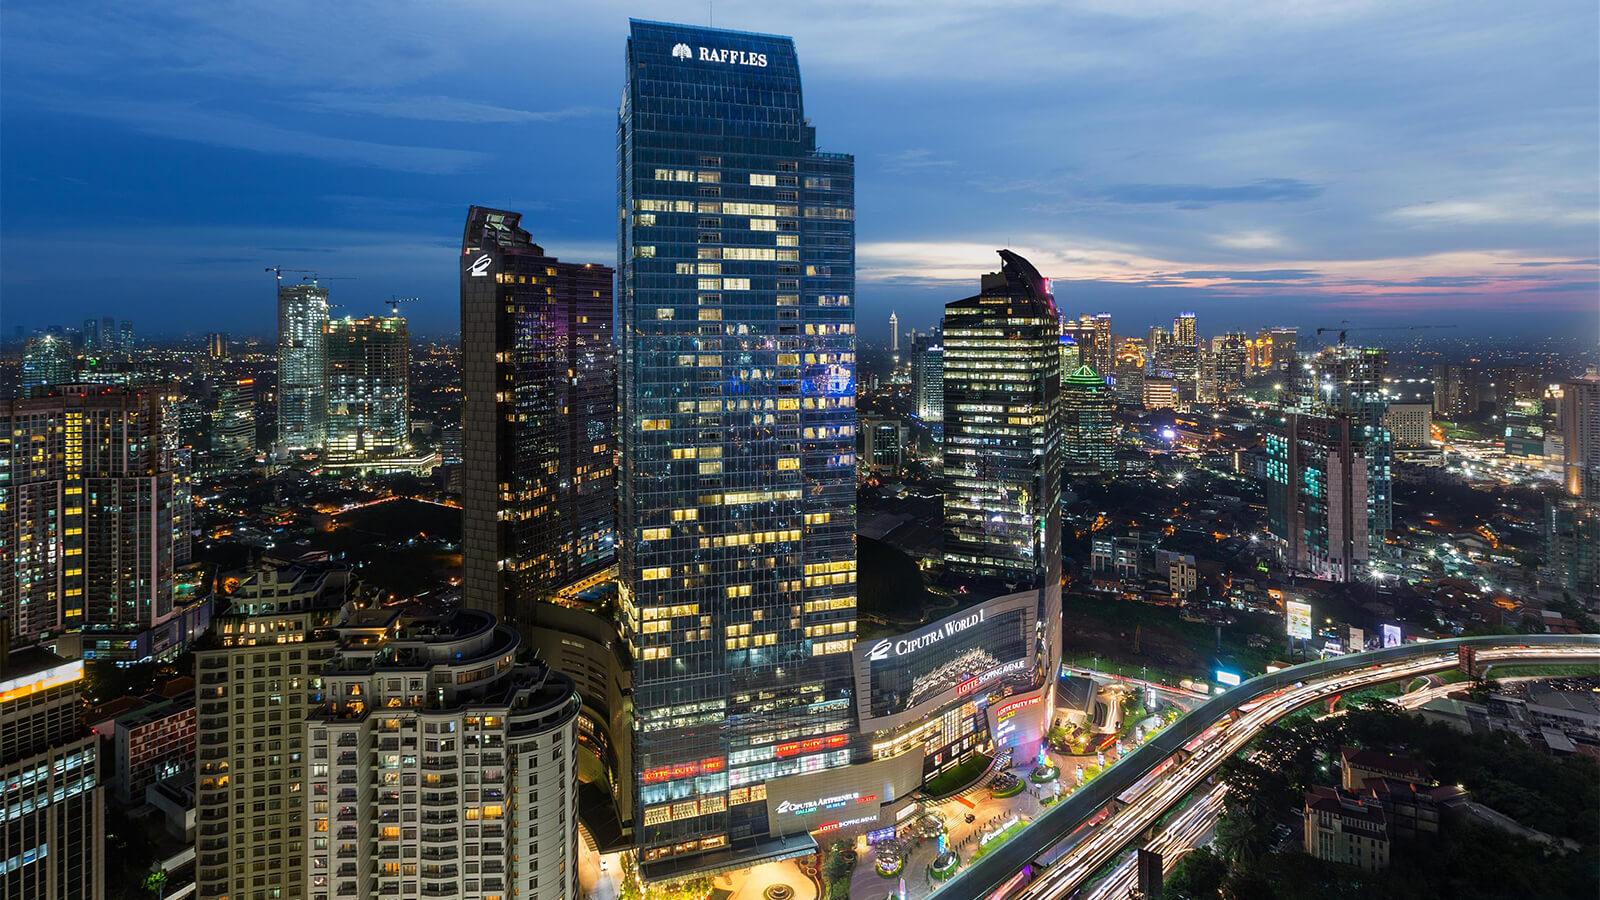 Raffles Jakarta Gece Ön Cephe